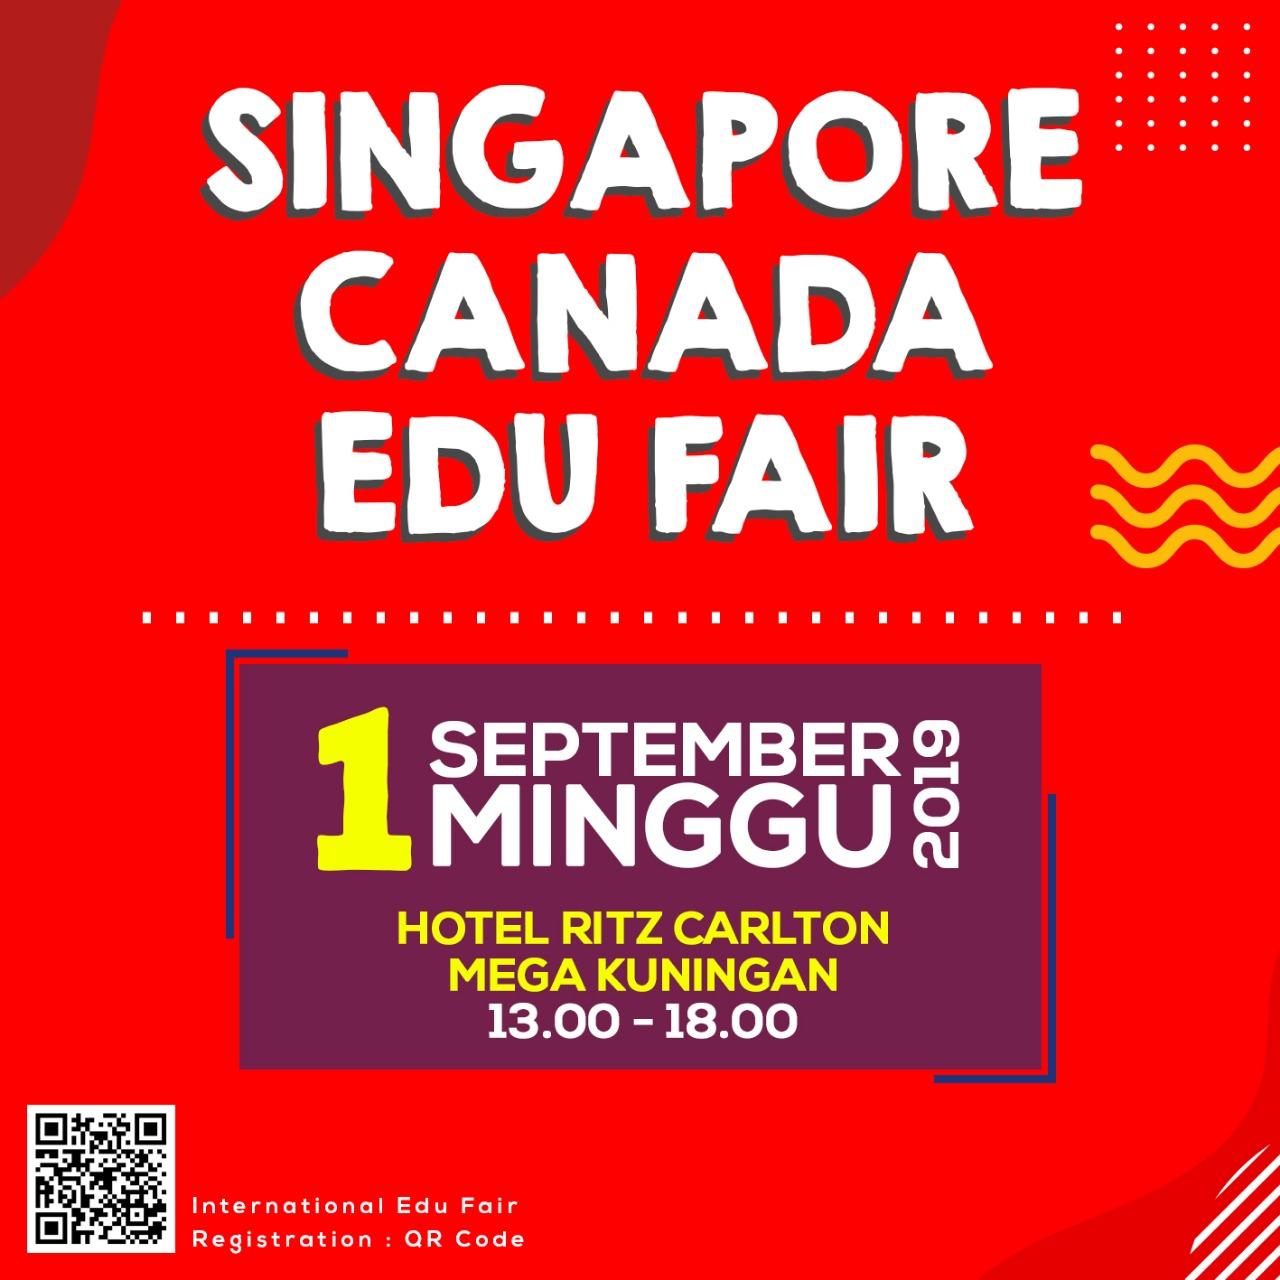 SINGAPORE CANADA EDU FAIR